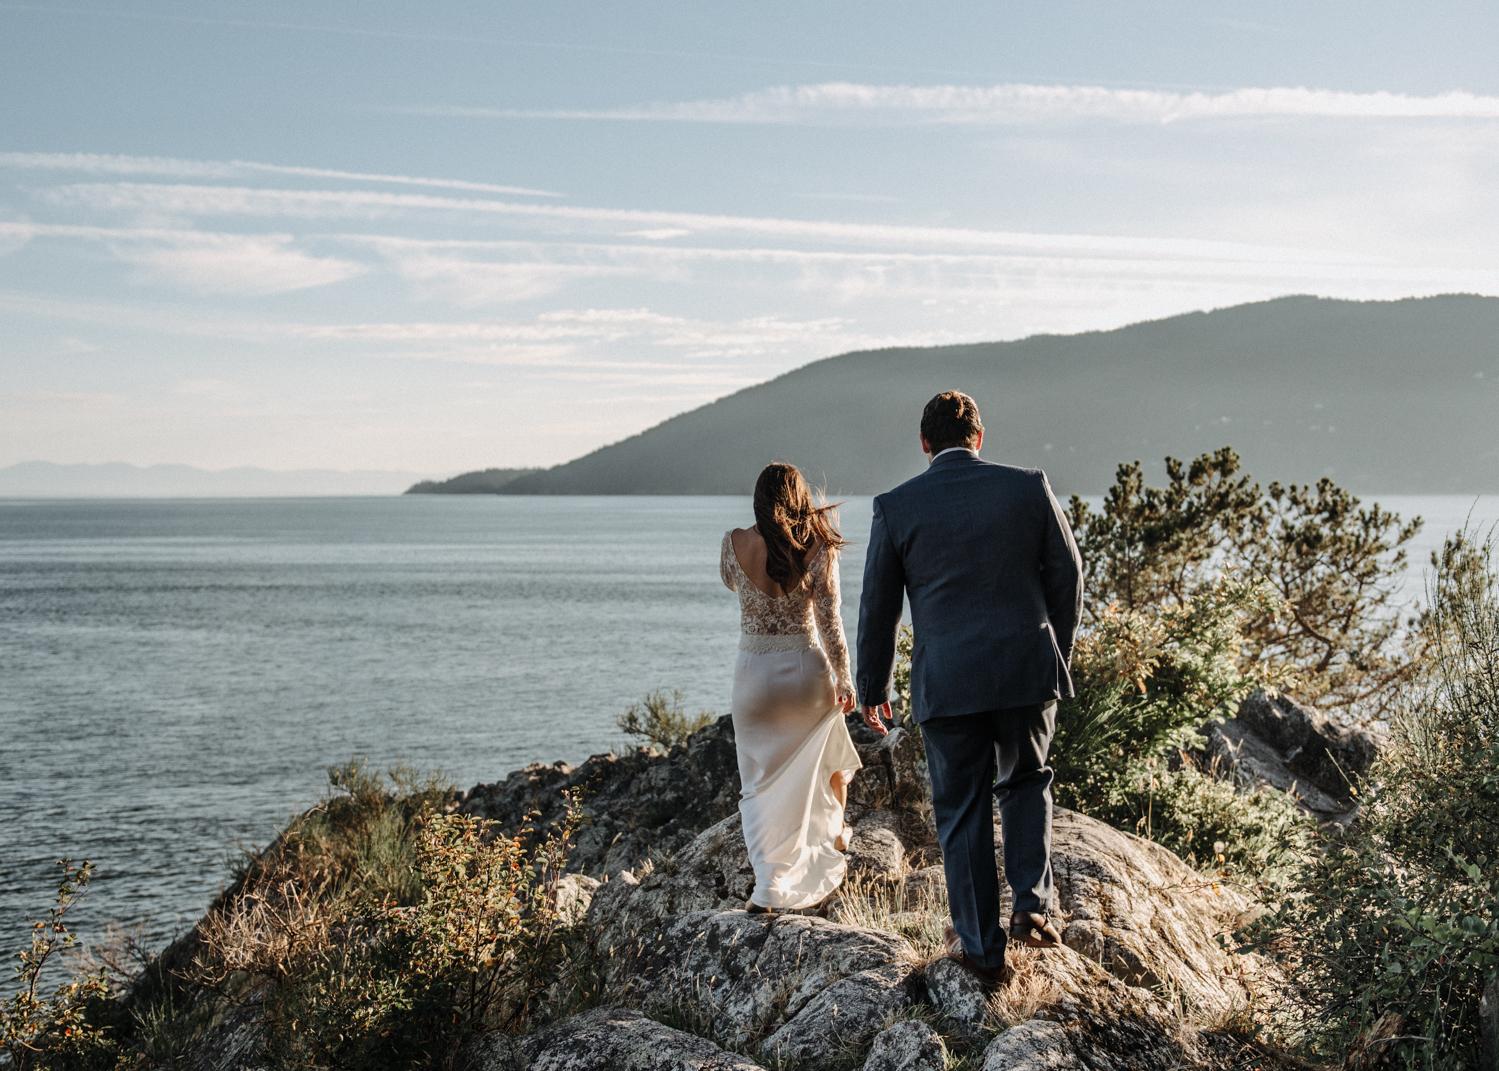 kaoverii_silva_photographer_lison_iman_wedding_websize-297.jpg